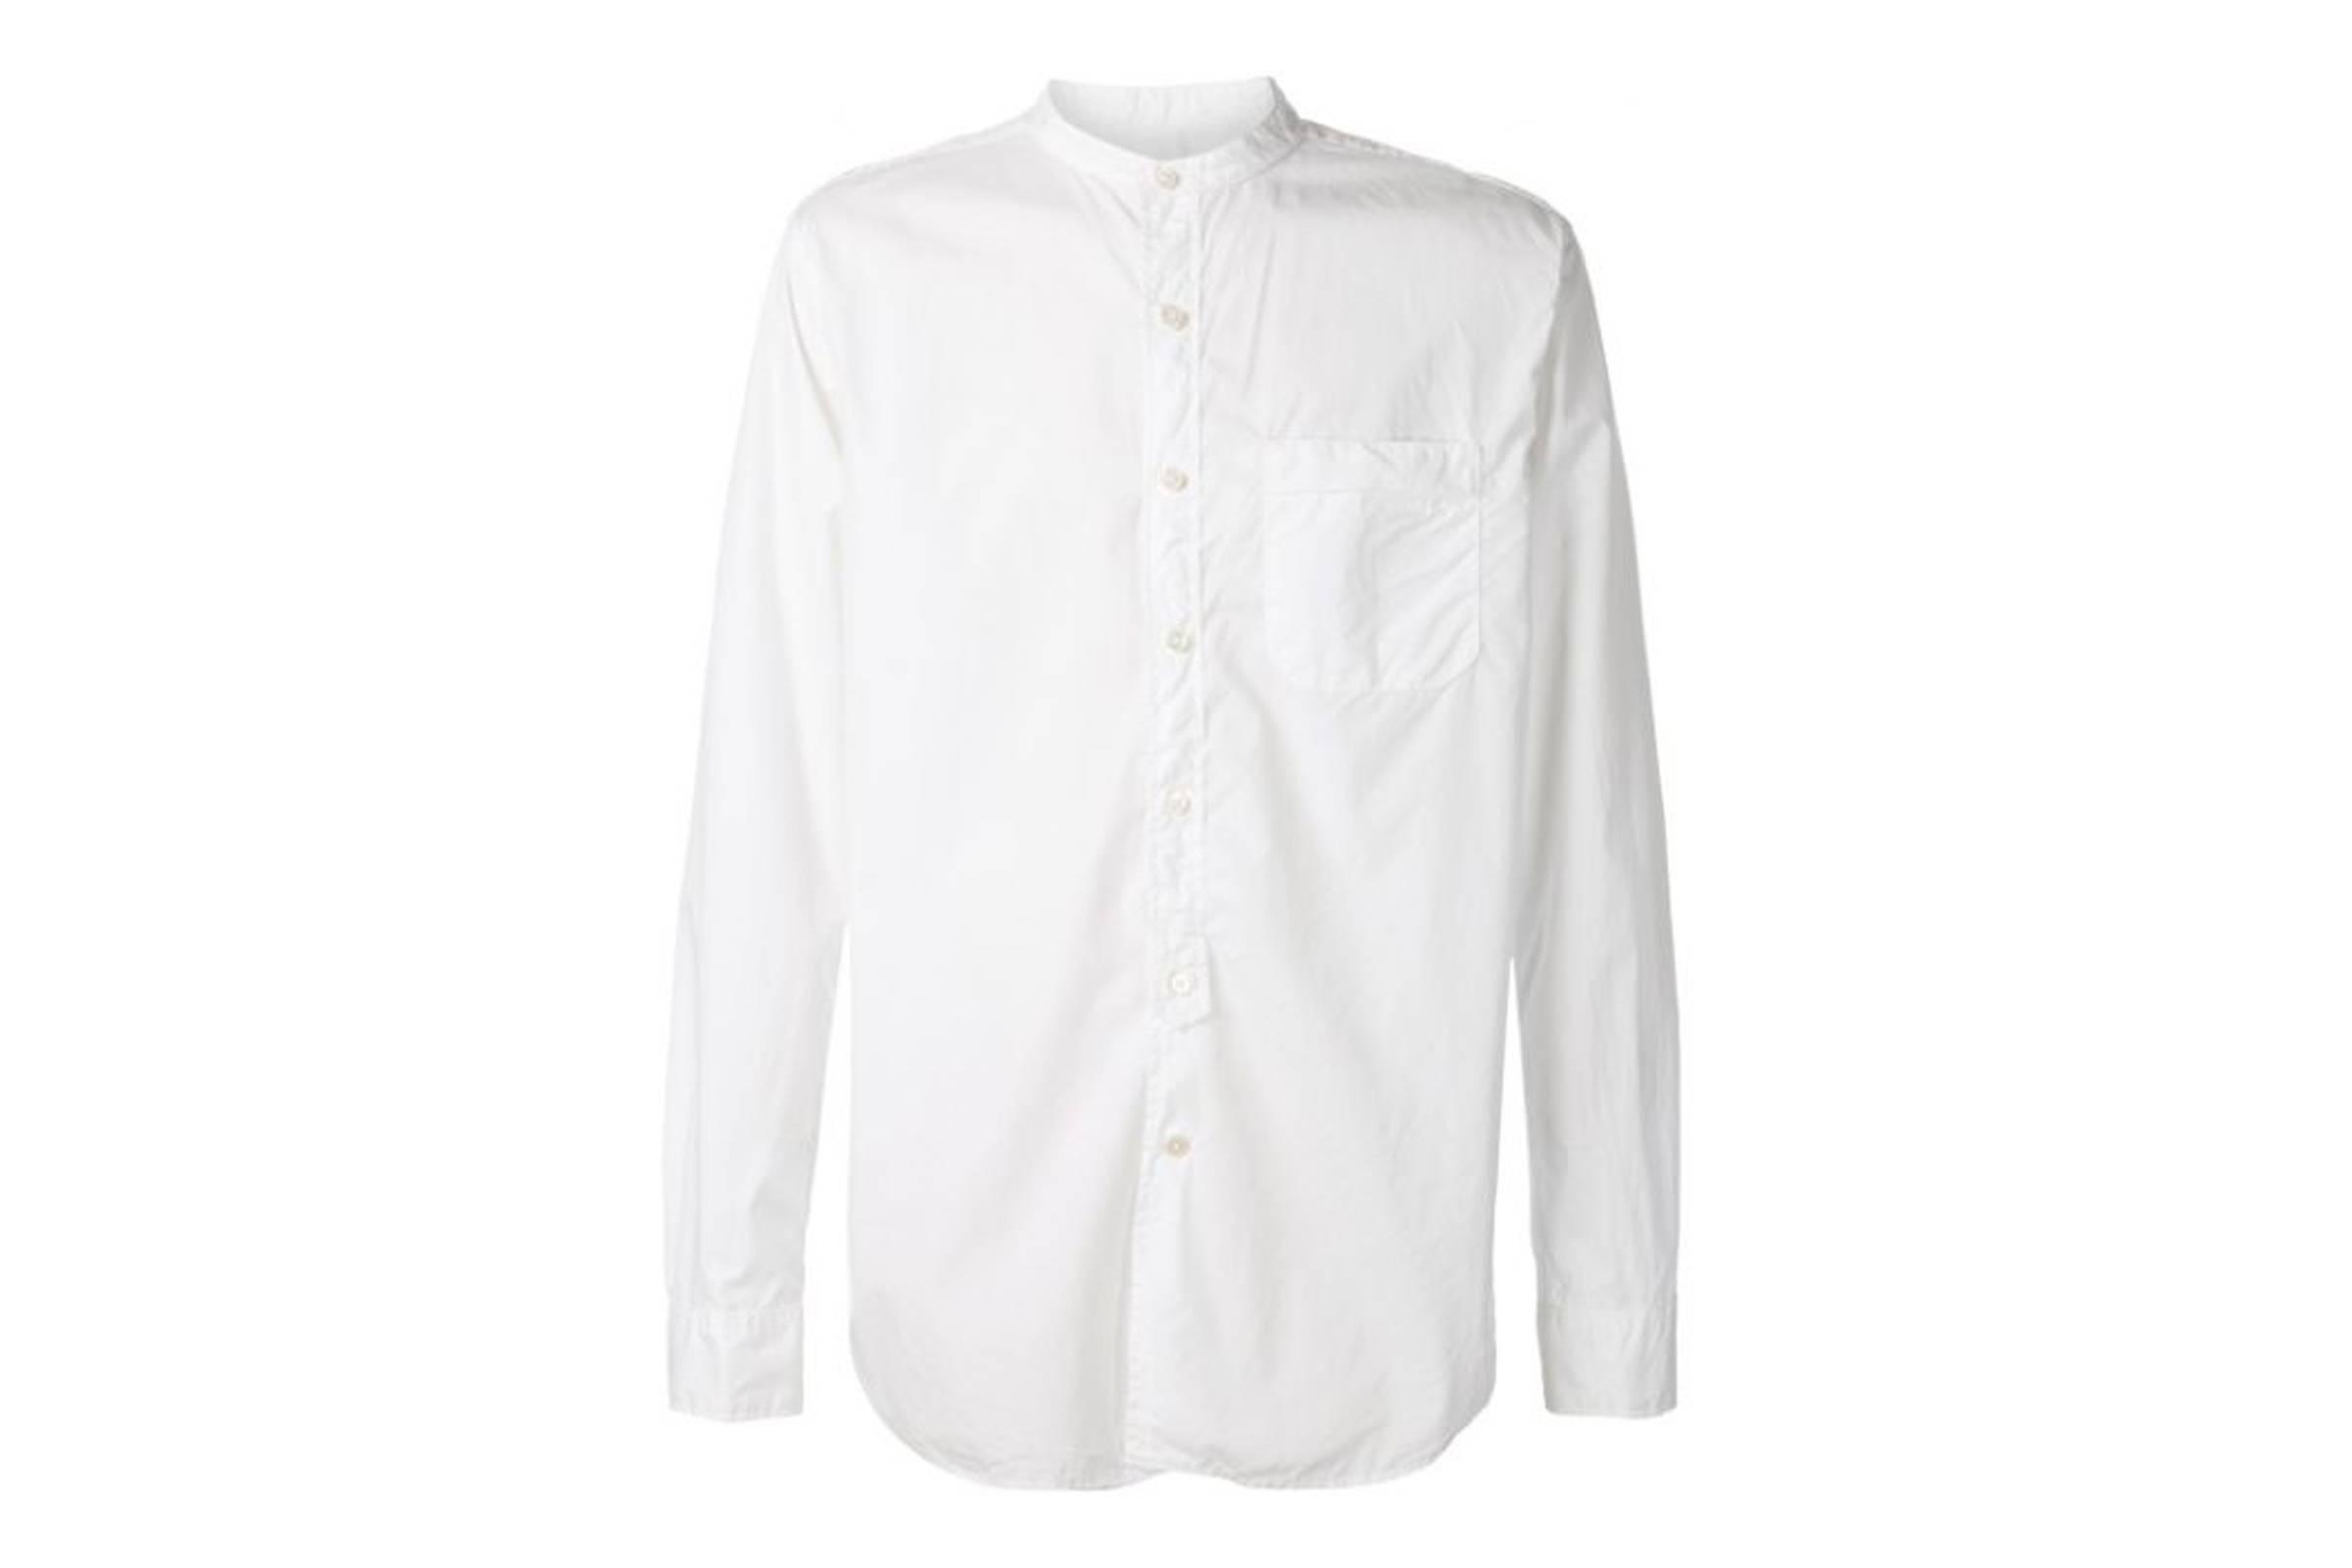 Engineered Garments Mandarin Collar Shirt